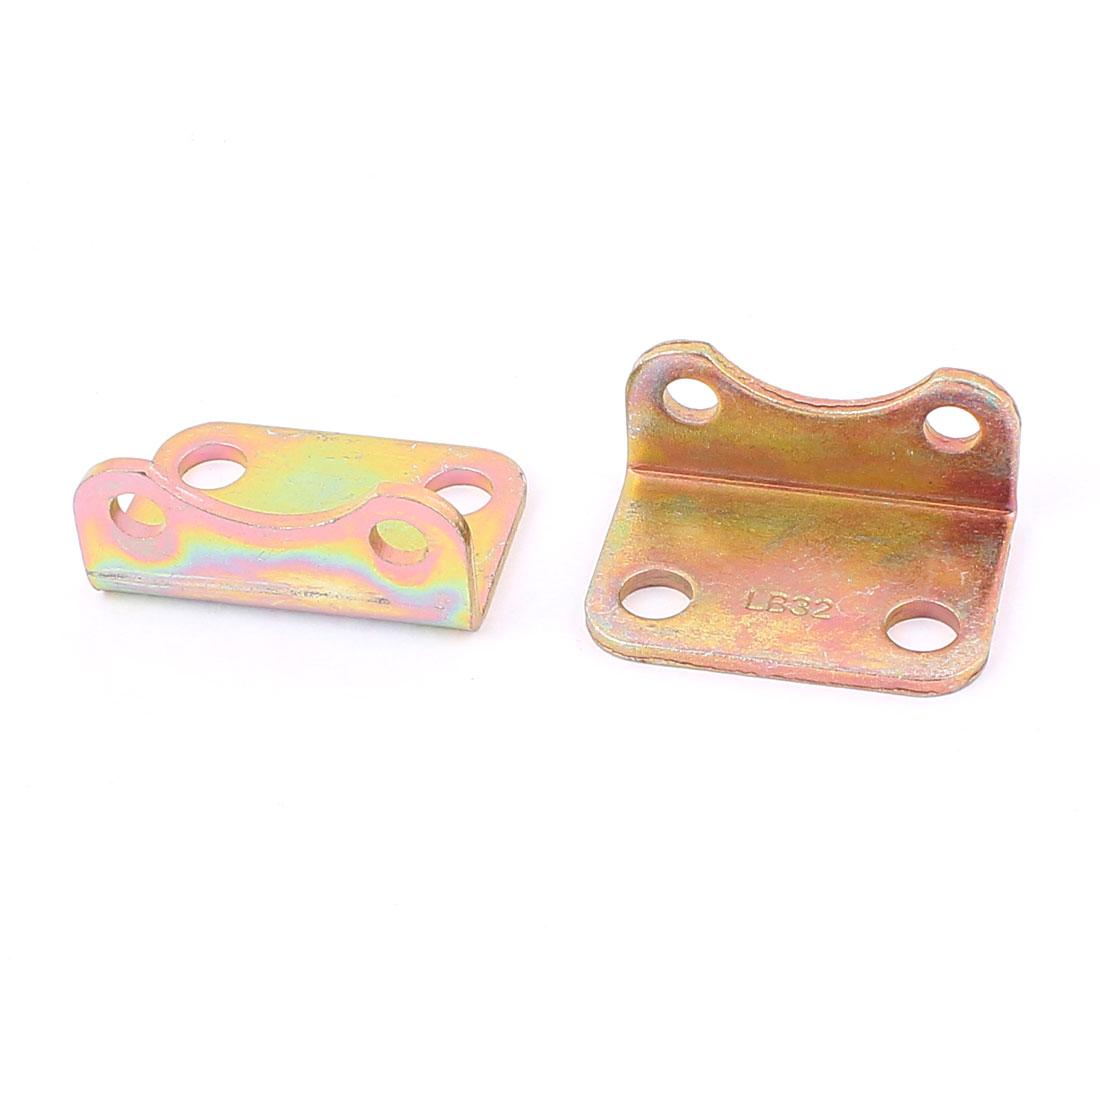 4 Hole 50 x 35 x 23mm Right Angle Brass Tone Corner Bracket 2 Pcs